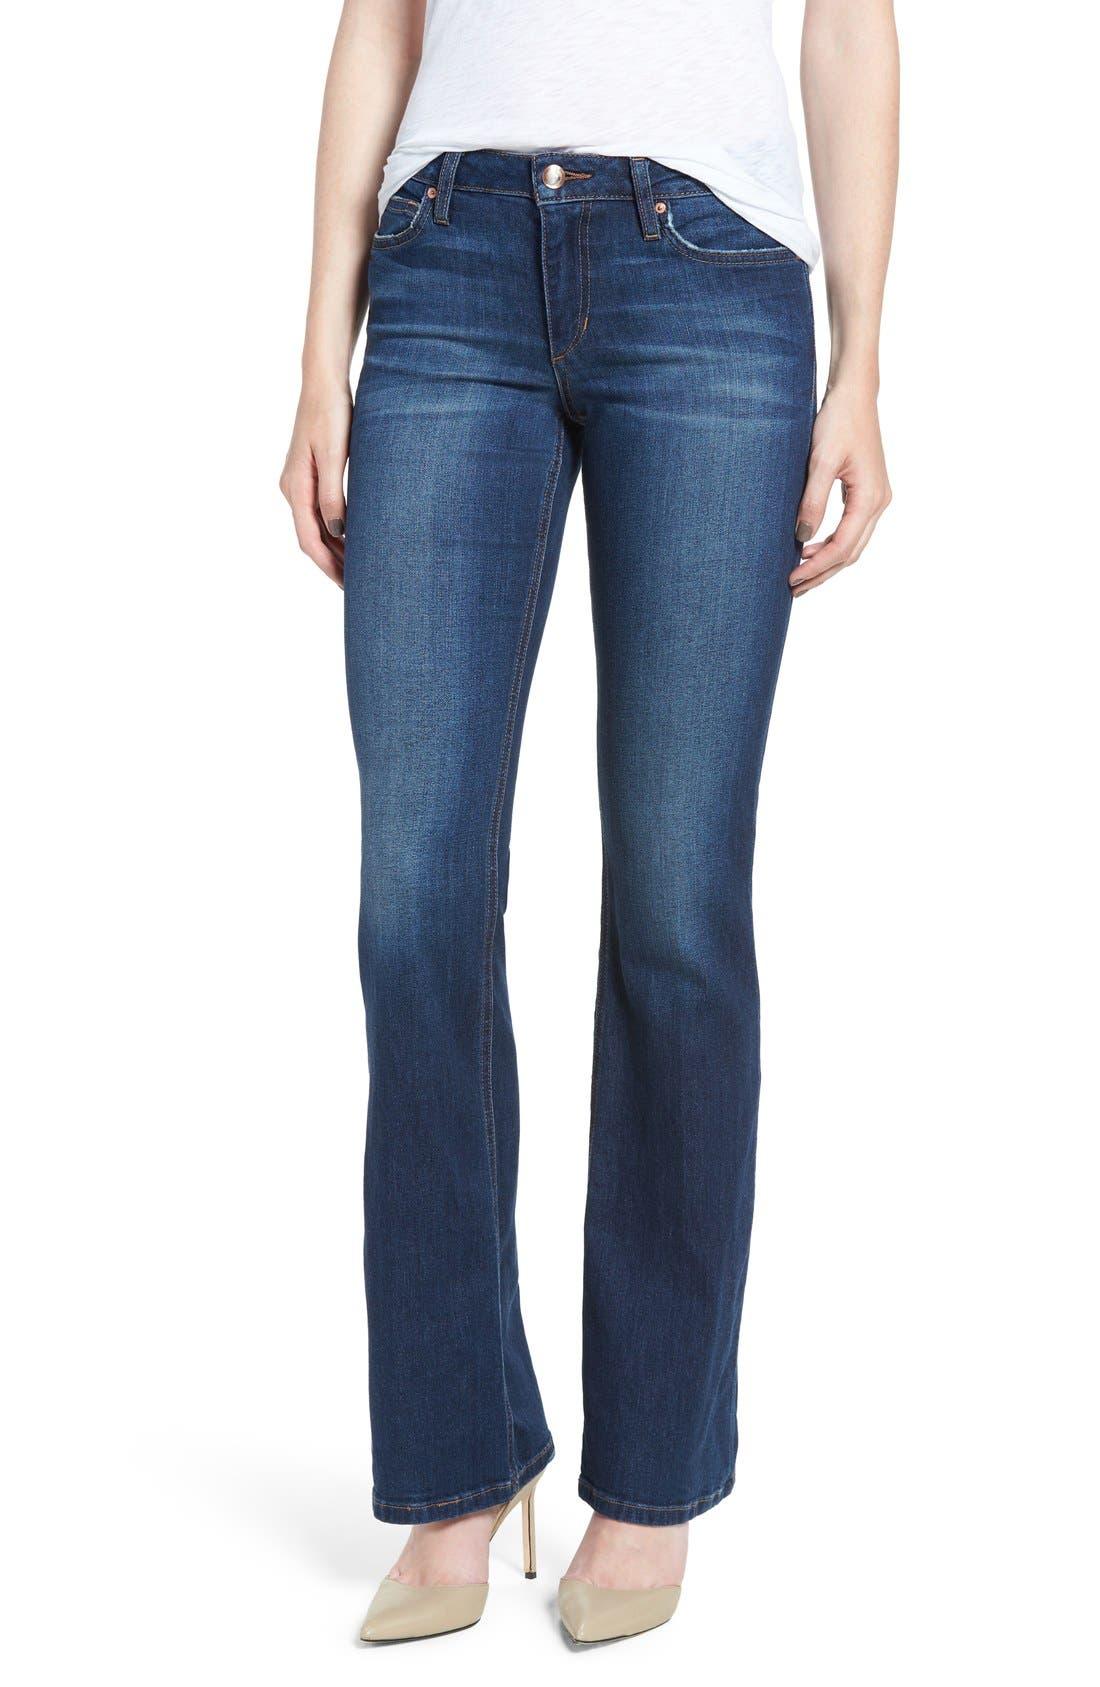 Main Image - Joe's 'Flawless - Honey' Curvy Bootcut Jeans (Lyla)